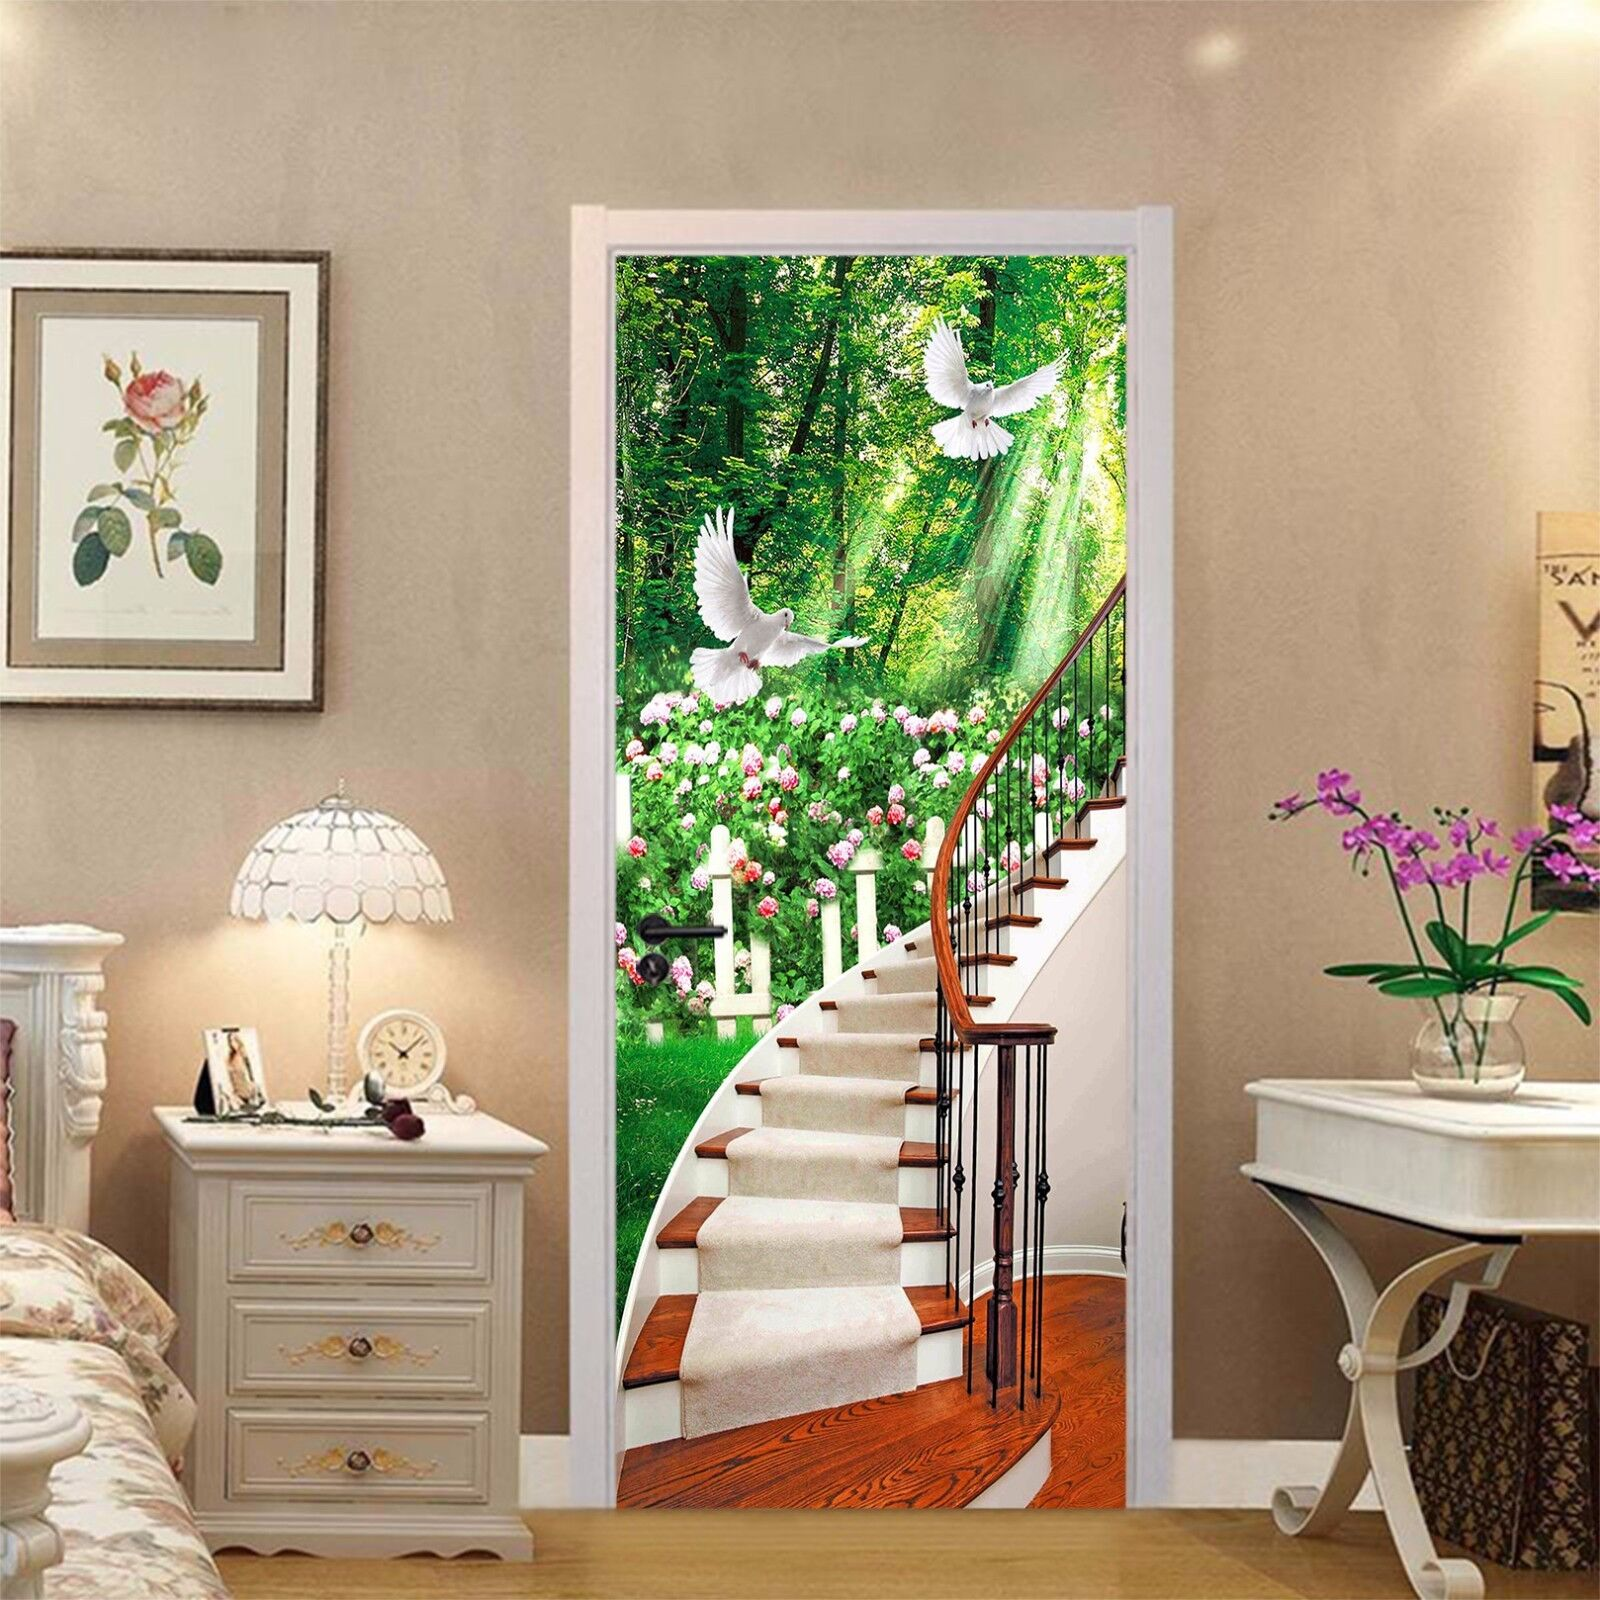 3D Tauben 752 Tür Wandmalerei Wandaufkleber Aufkleber AJ WALLPAPER DE Kyra  | Verkauf Online-Shop  | Glücklicher Startpunkt  | Hohe Qualität